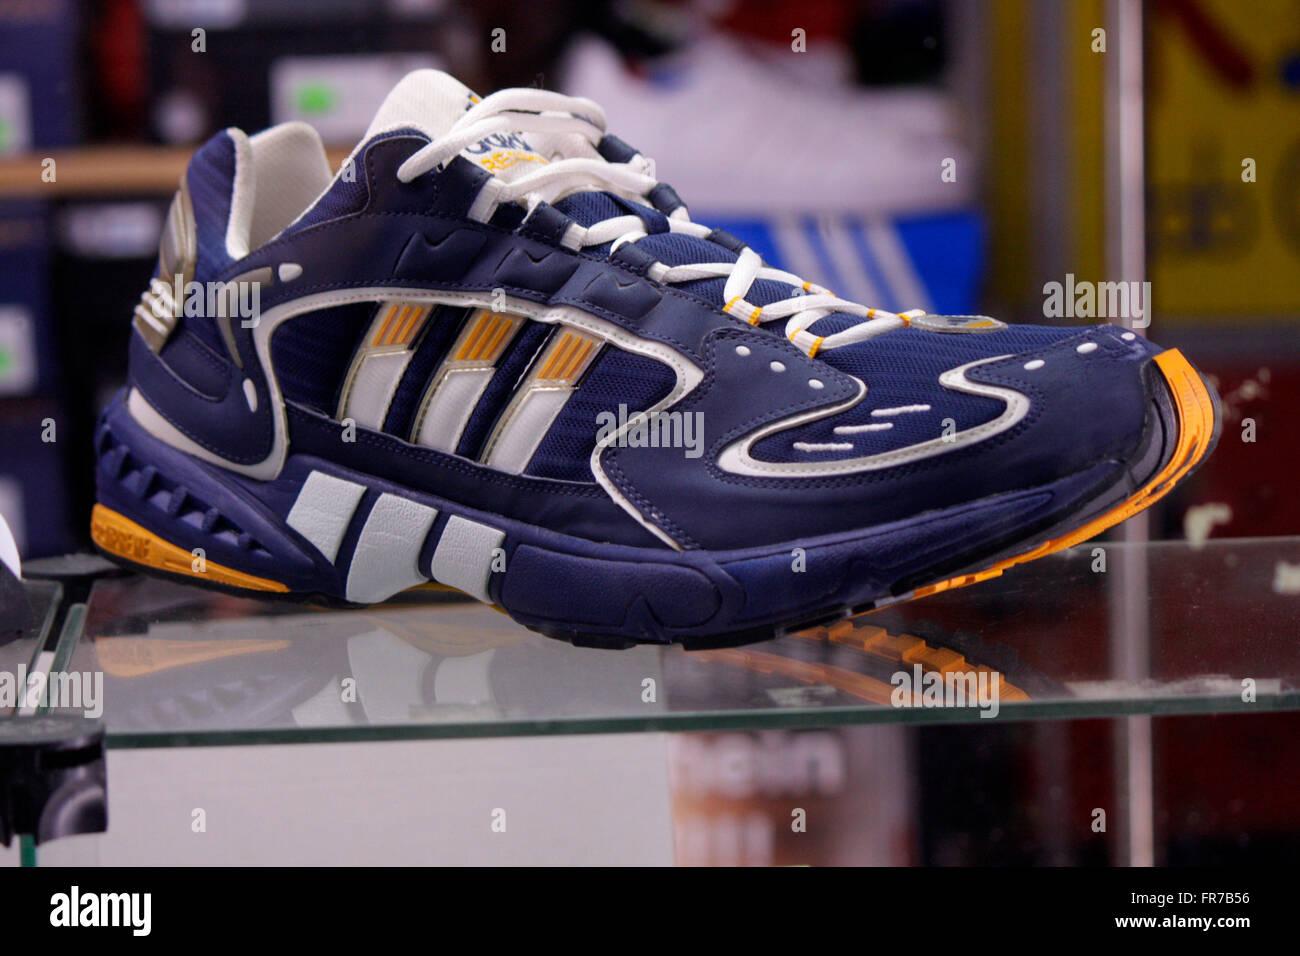 "Markenname: ""Adidas"", Berlin. Stockfoto"